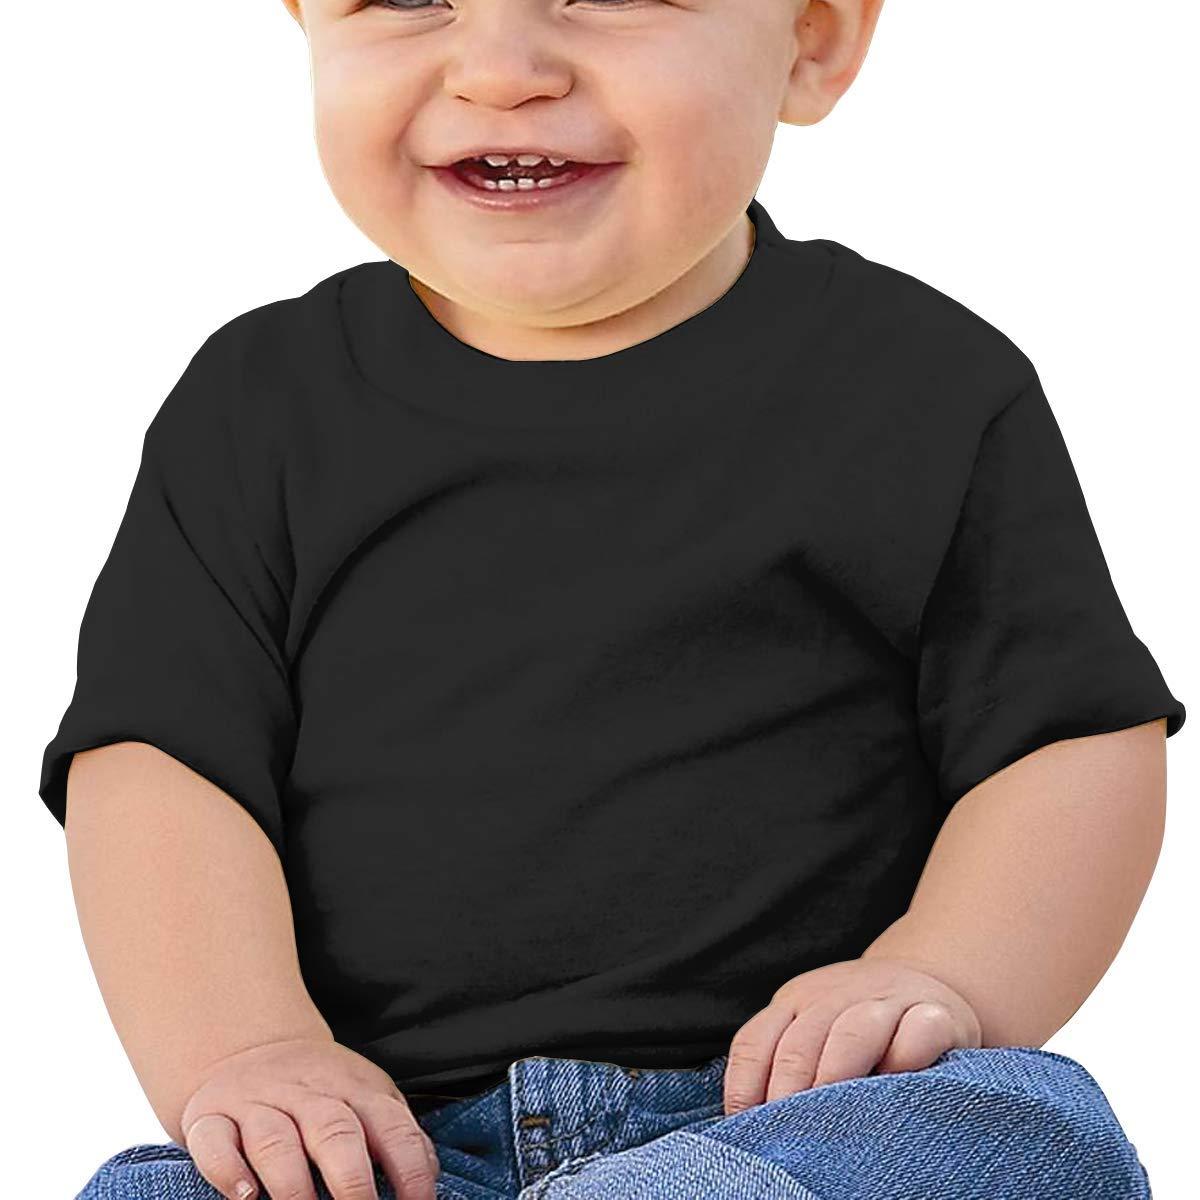 STARKLY Chicago Flag Skyline Bear Toddler Baby Newborn Short Sleeve Tee Shirt 6-24 Month 5 Tops